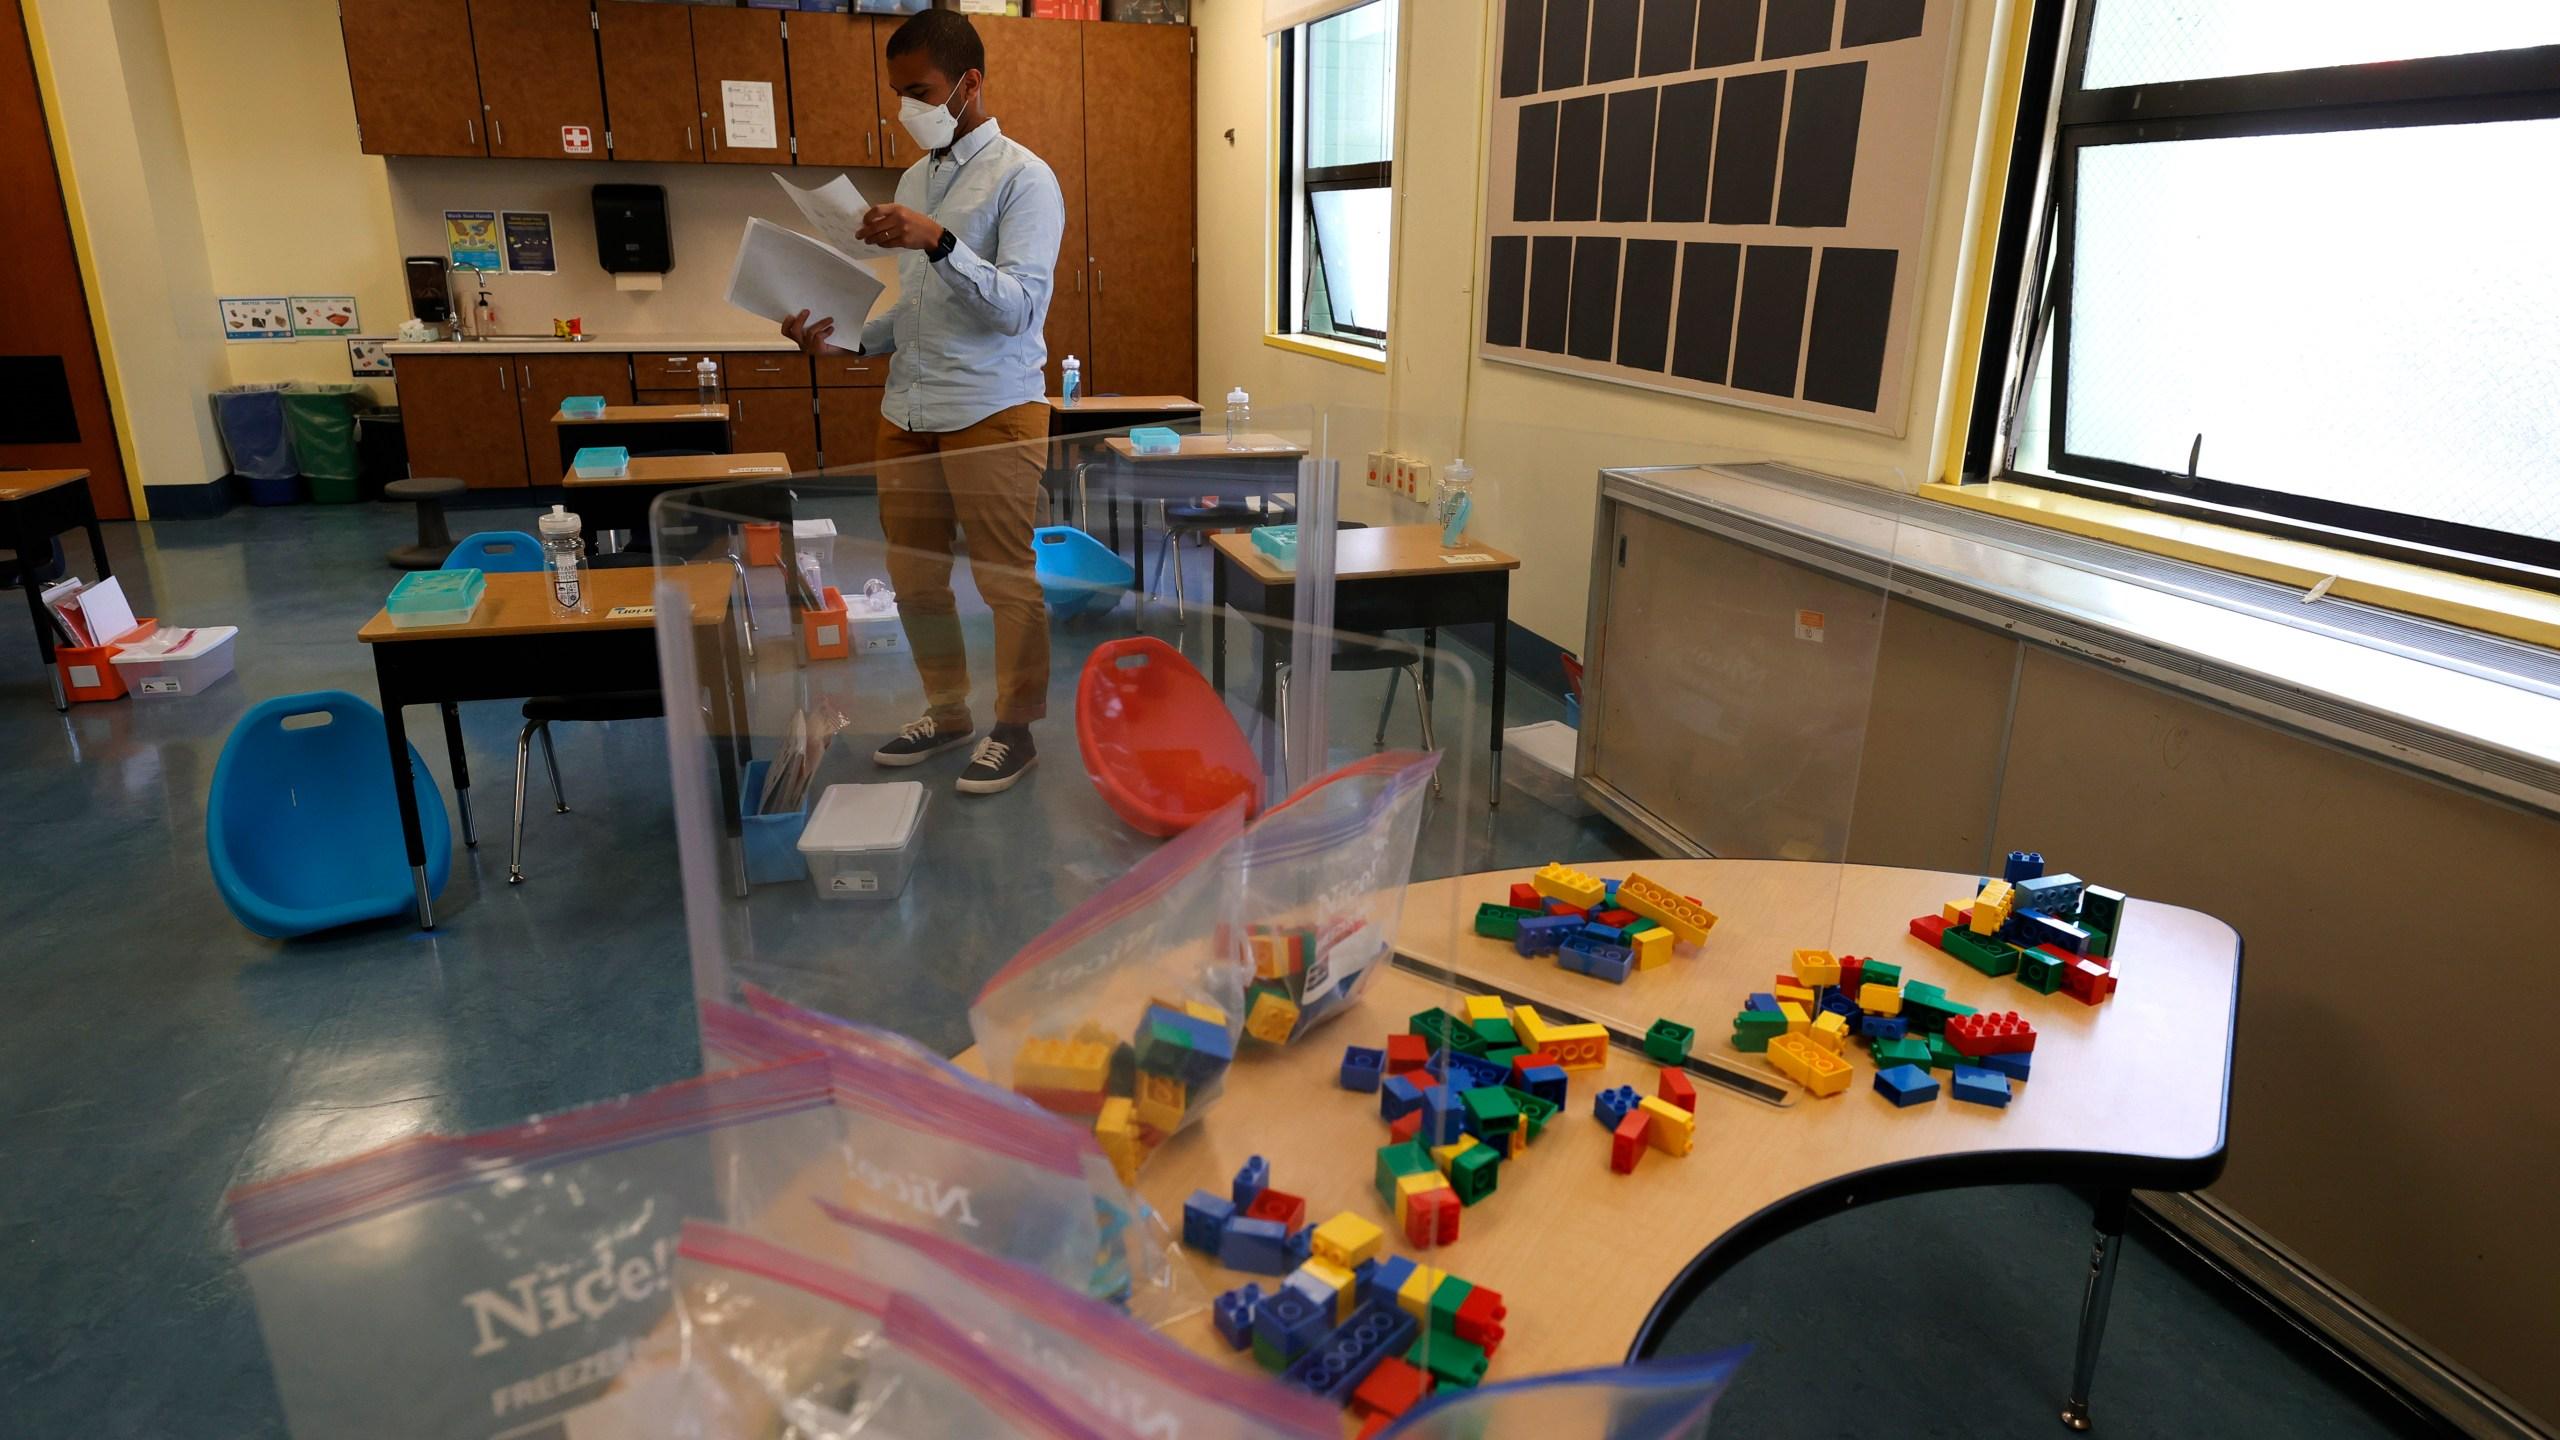 Bryant Elementary School kindergarten teacher Chris Johnson sets up his classroom on April 09, 2021 in San Francisco, California. (Justin Sullivan/Getty Images)